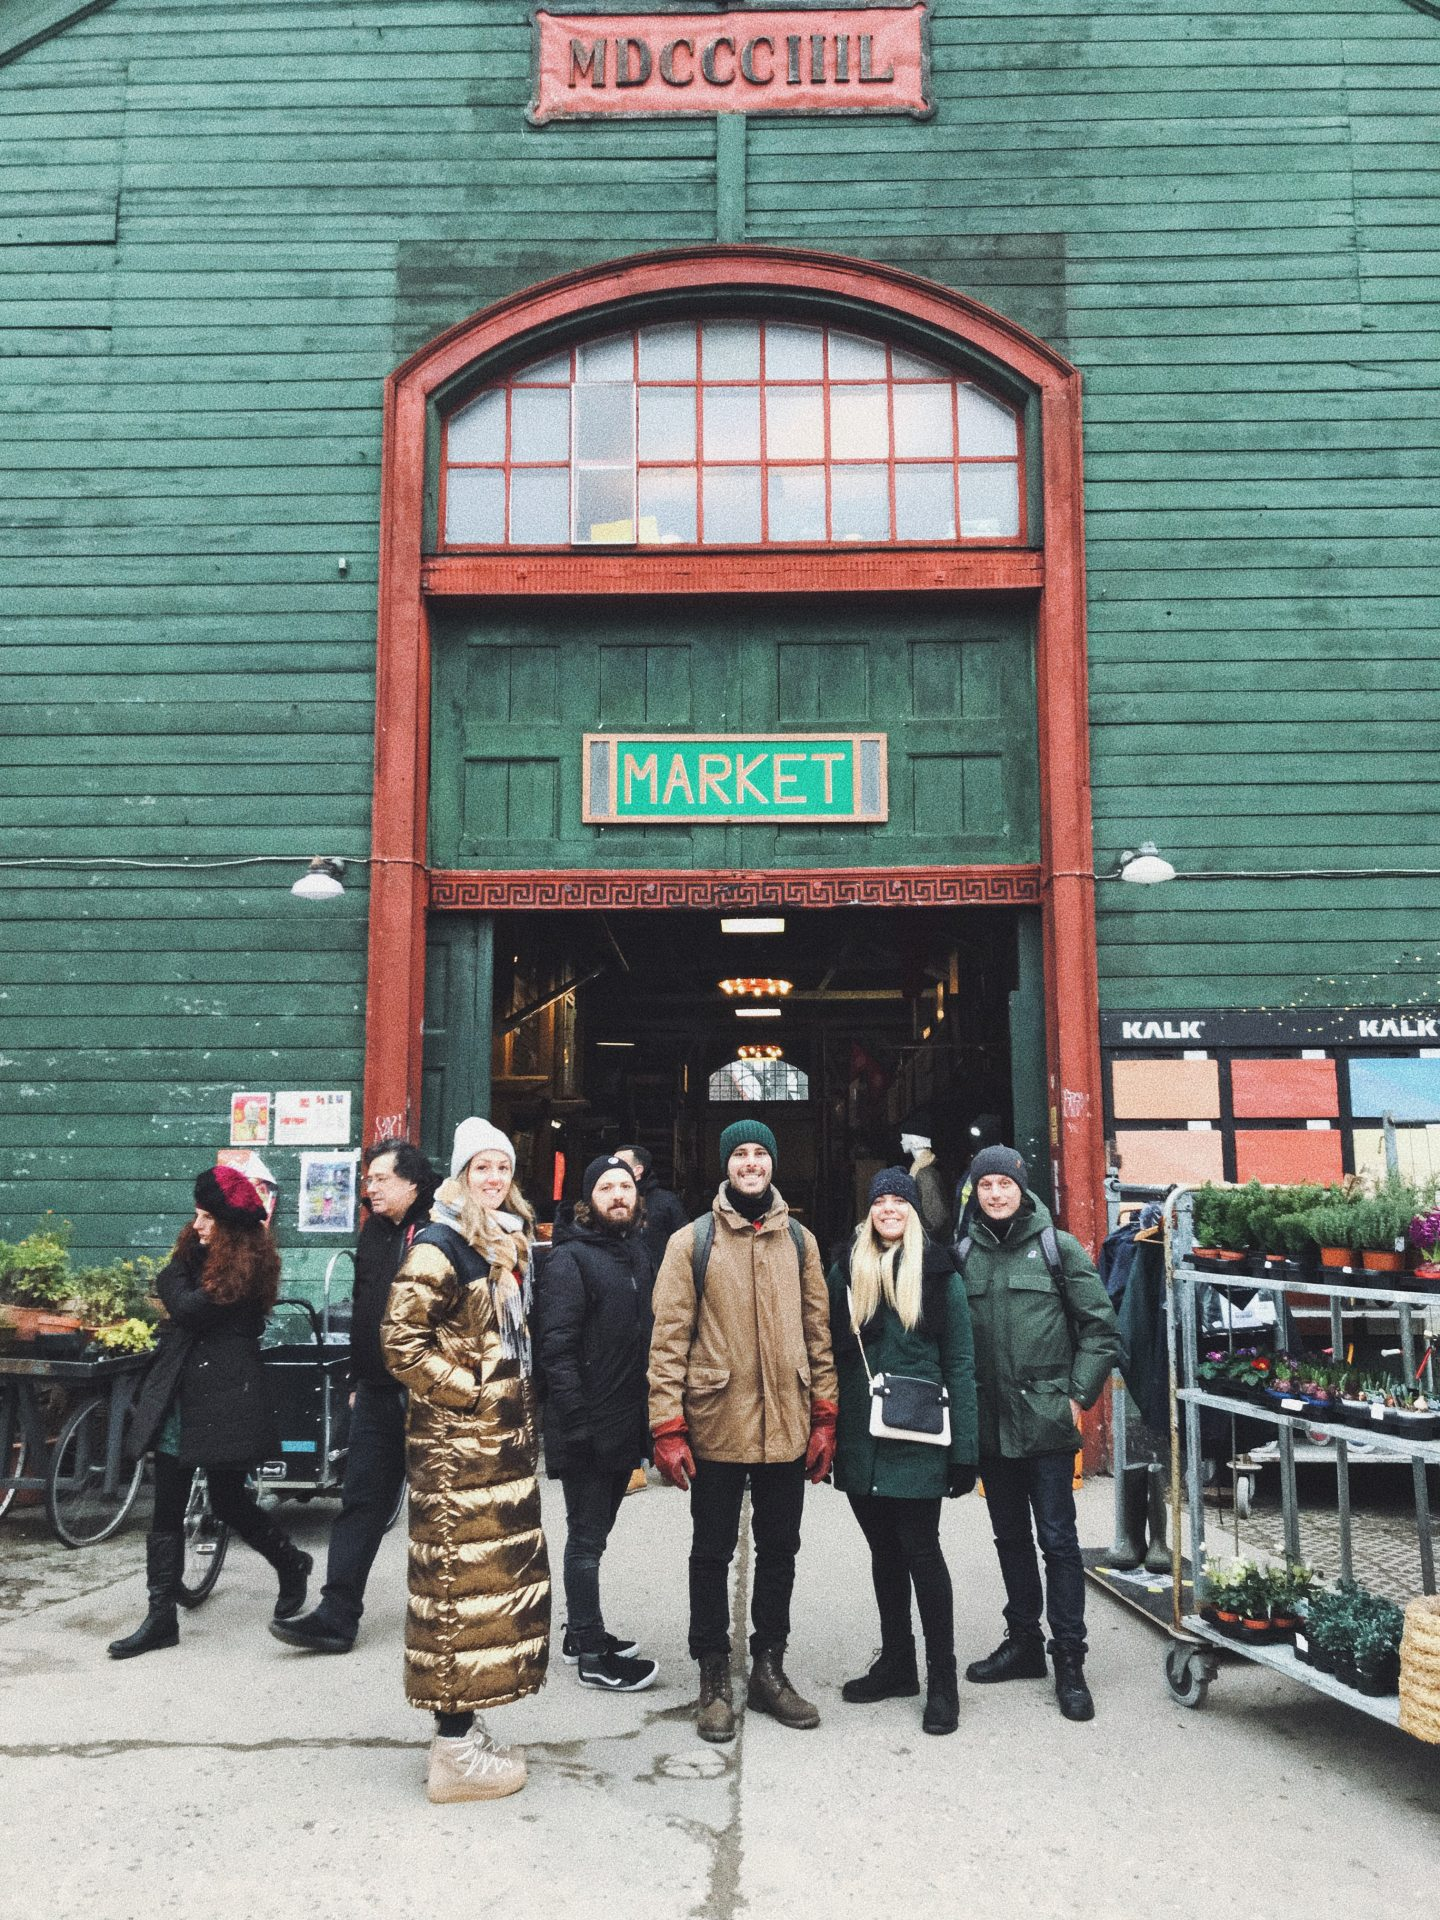 Christiania Copenhague marie and mood blog